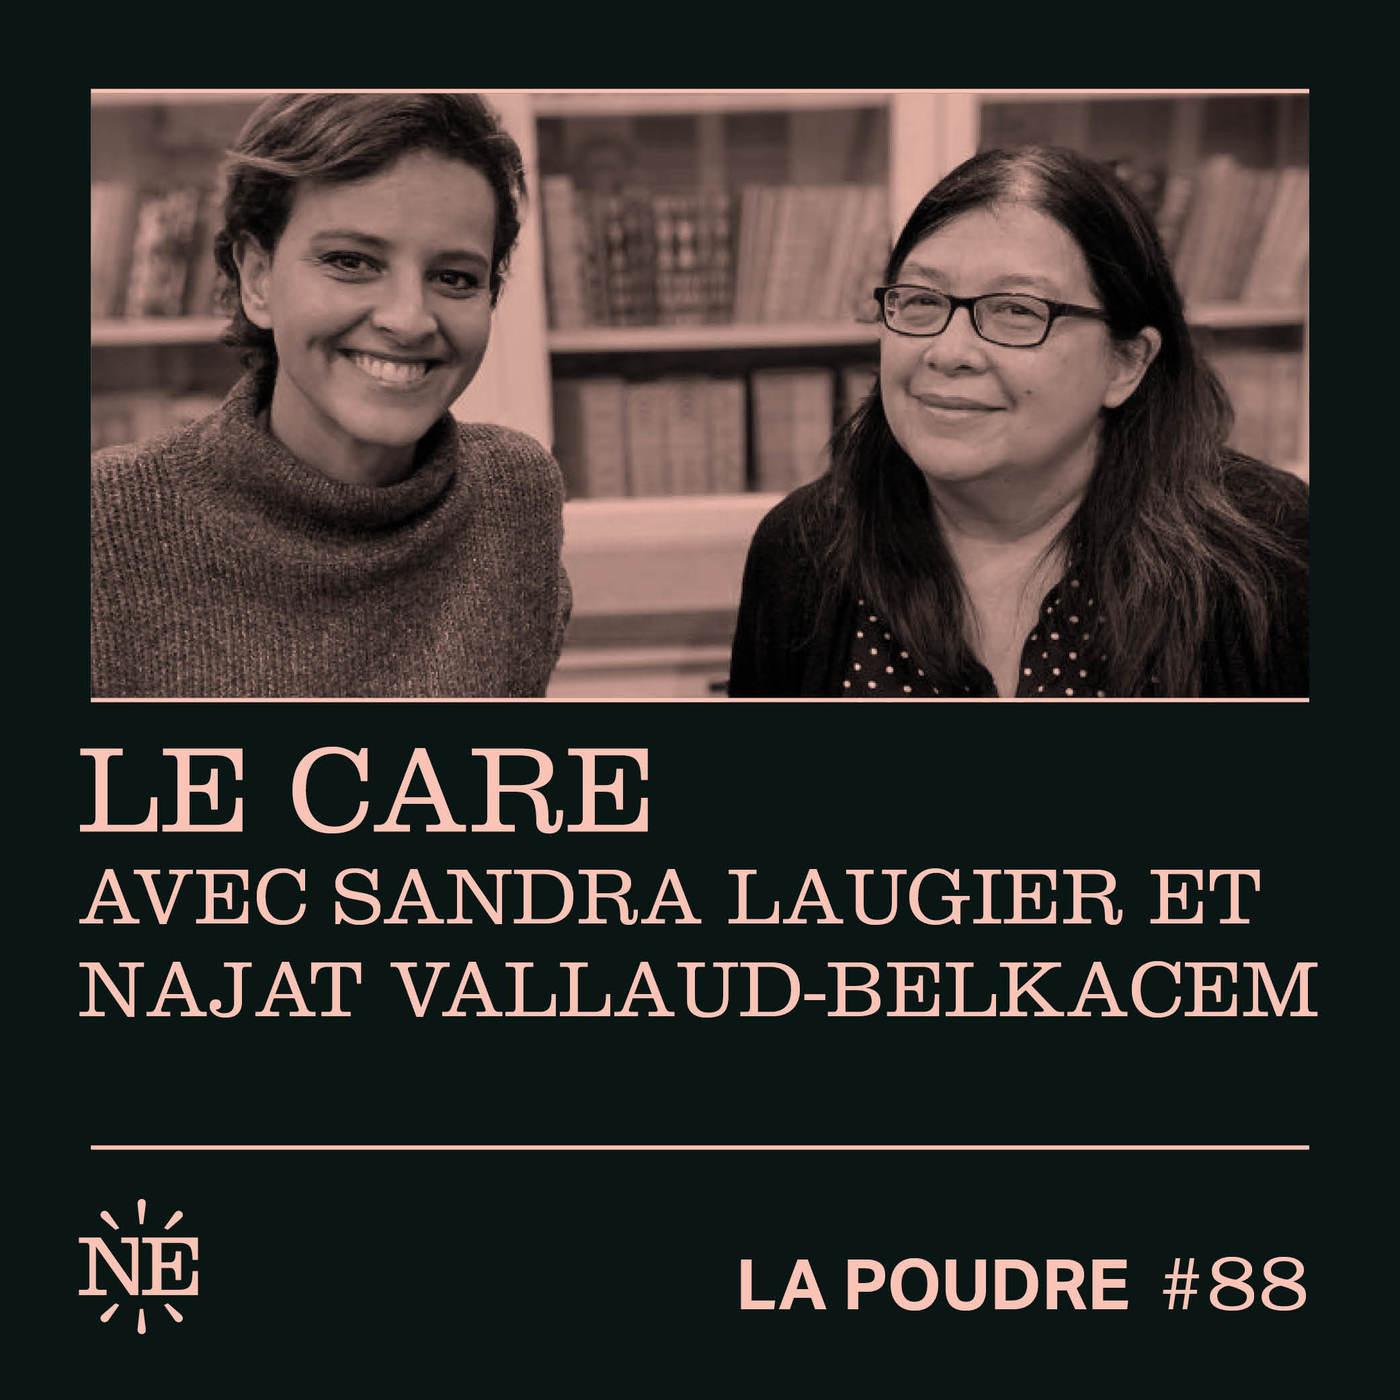 Épisode 88 - Le care avec Sandra Laugier et Najat Vallaud-Belkacem